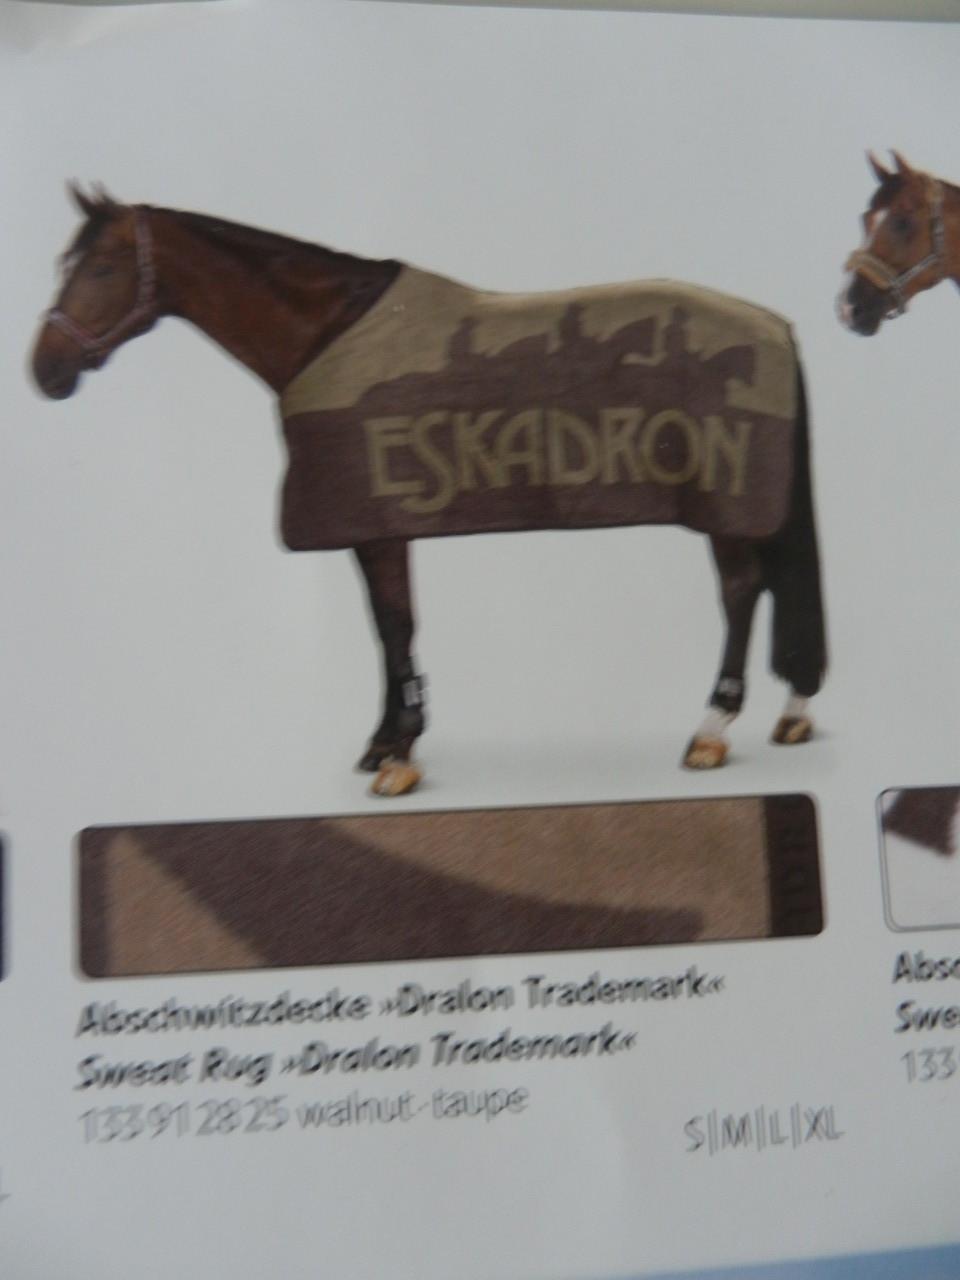 sweat rug Dralon -walnut-taupe